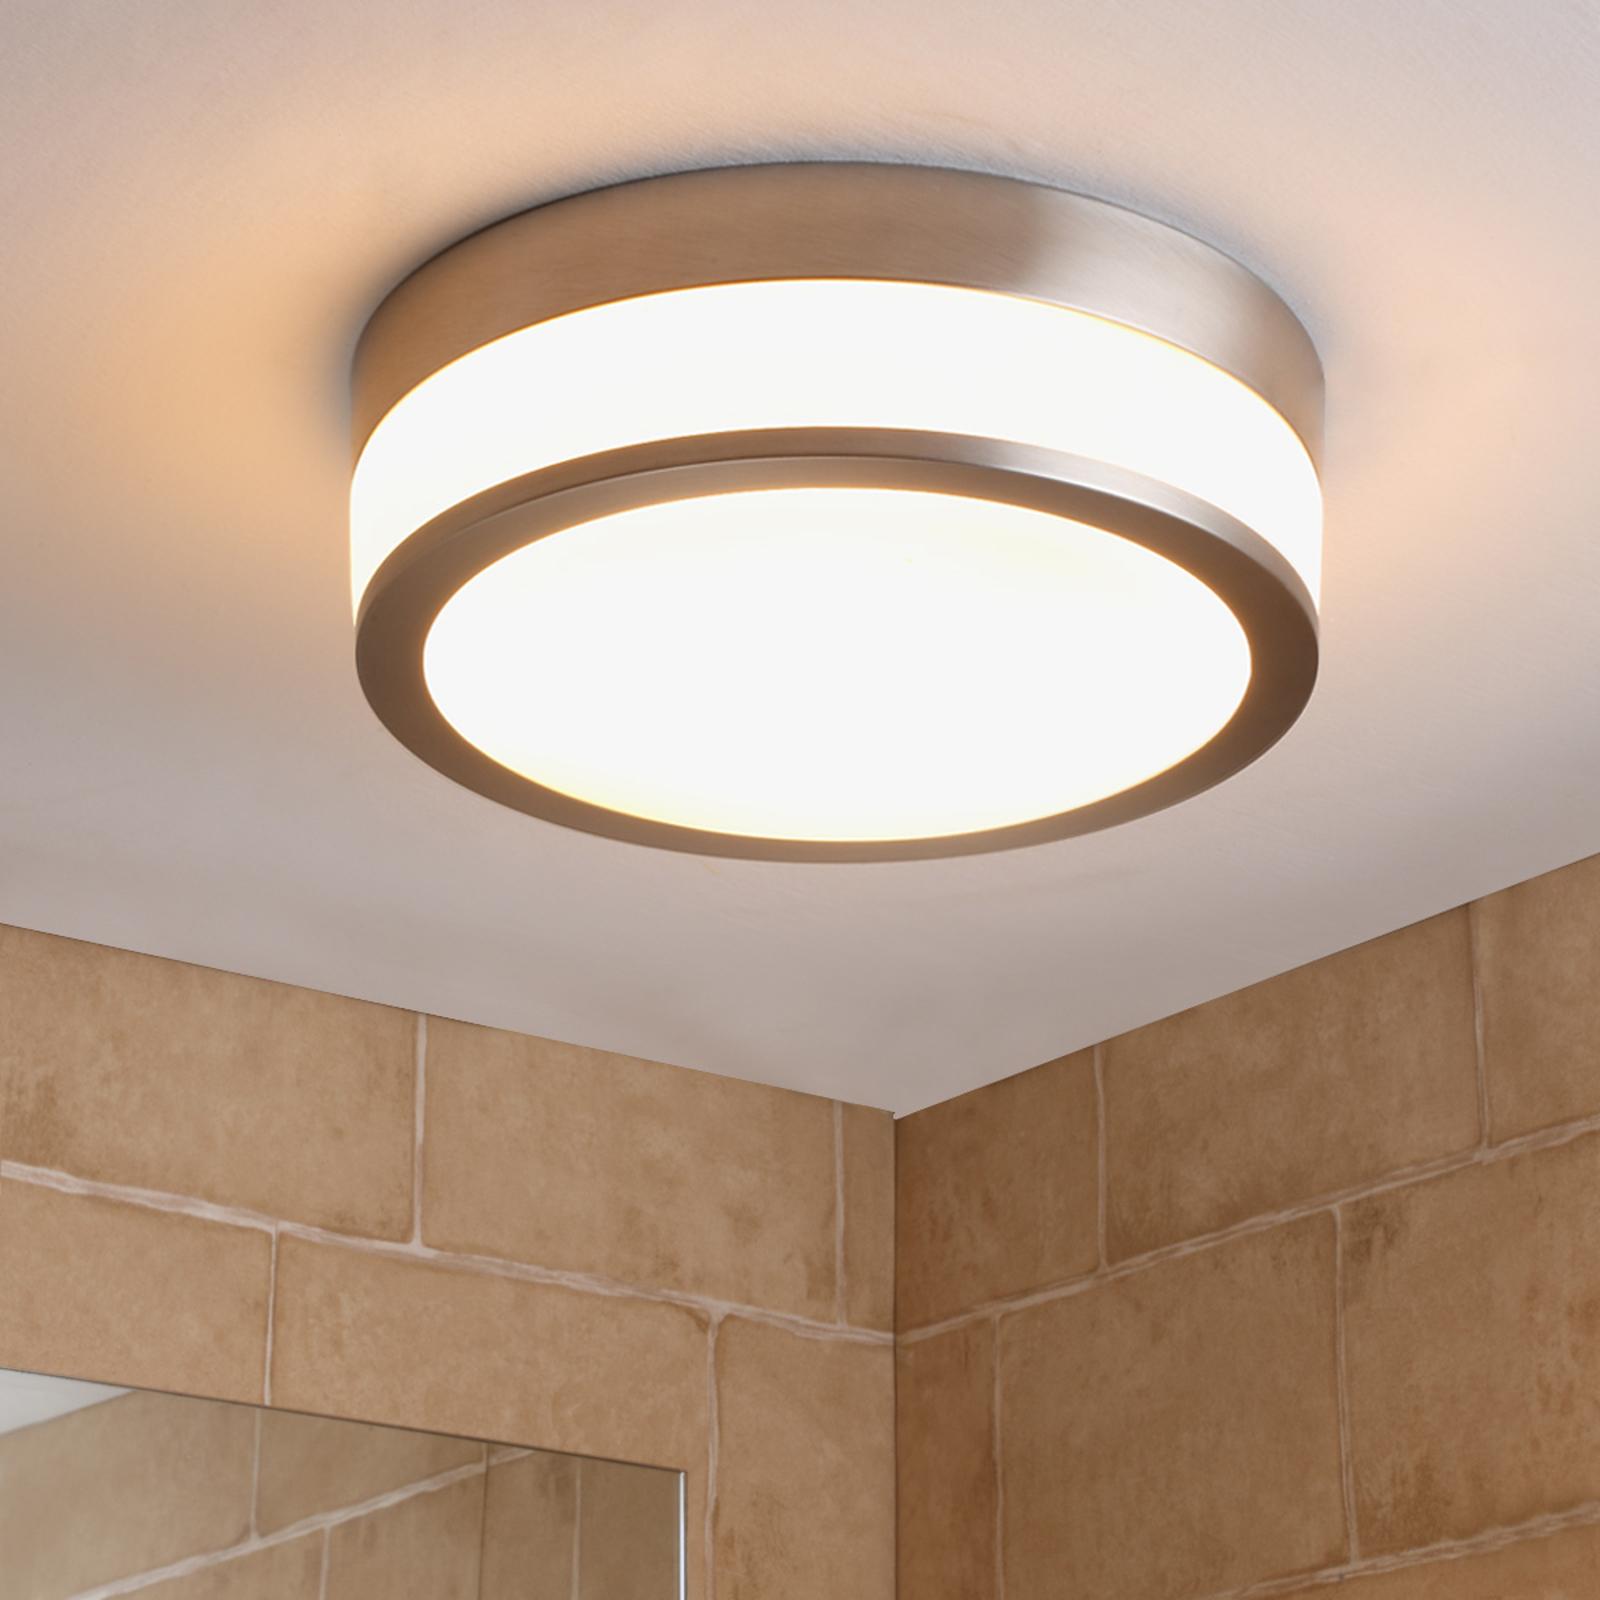 Lindby Flavi plafón LED para baño Ø 28cm níquel